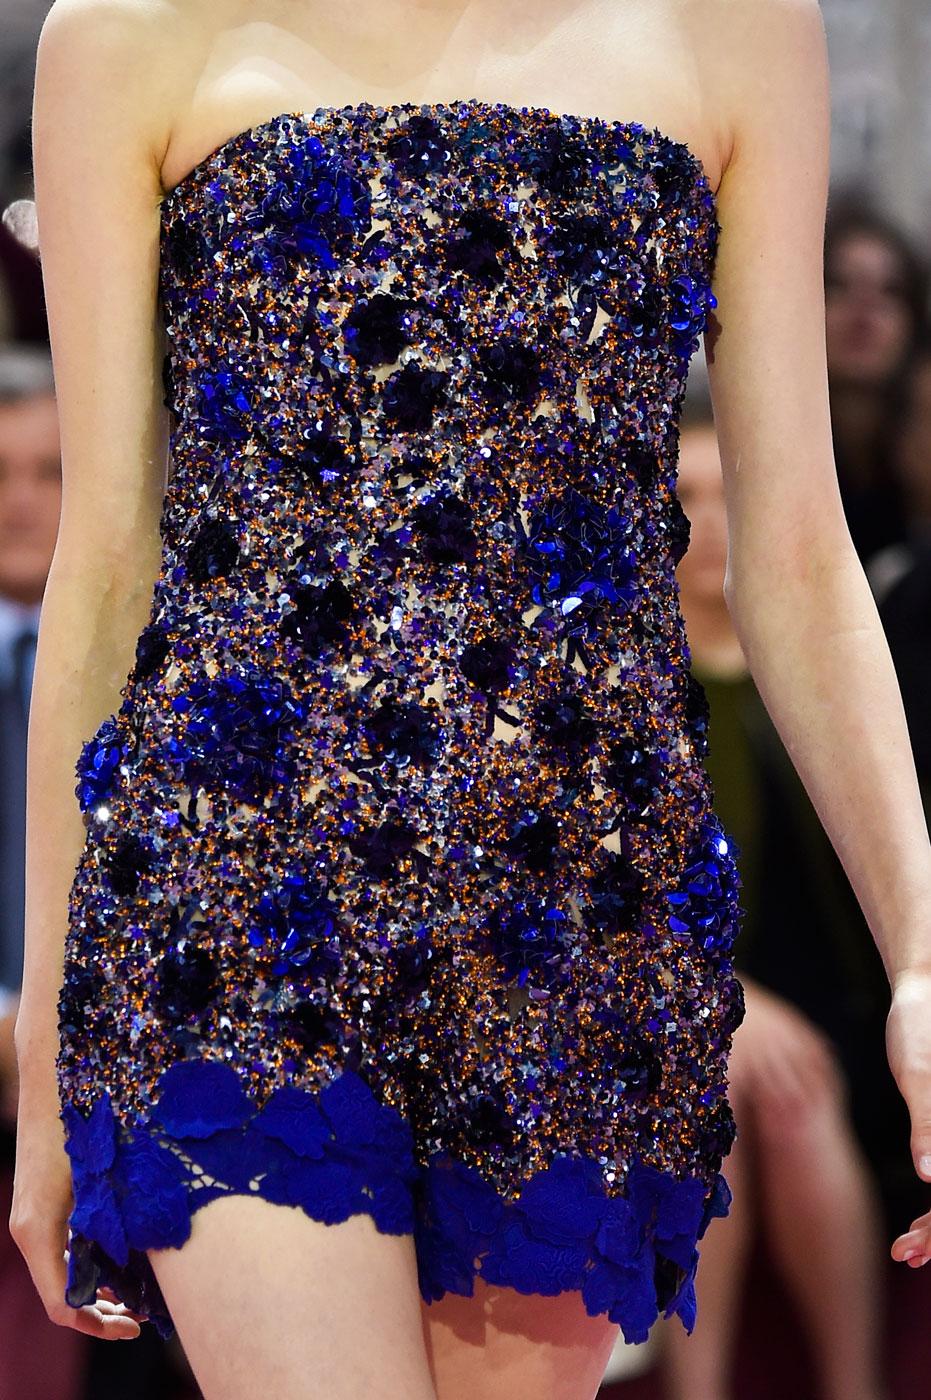 Christian-Dior-fashion-runway-show-close-ups-haute-couture-paris-spring-summer-2015-the-impression-099